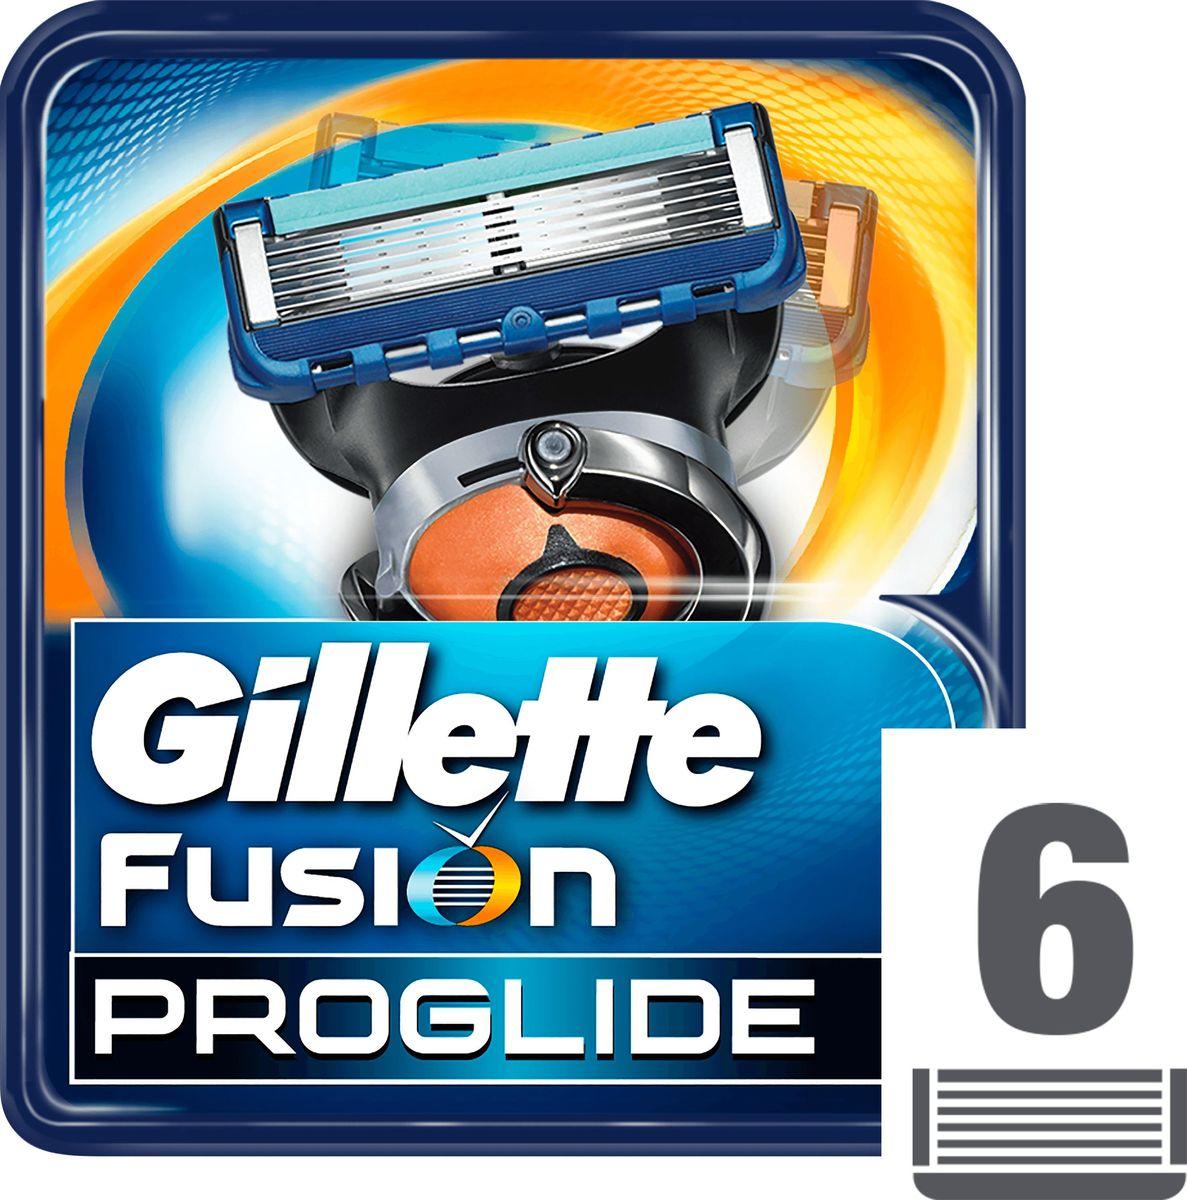 Gillette Fusion ProGlide Сменные кассеты для мужской бритвы, 6 шт diy acrylic mini table saw circular saws woodworking chainsaw cutting machine home tools